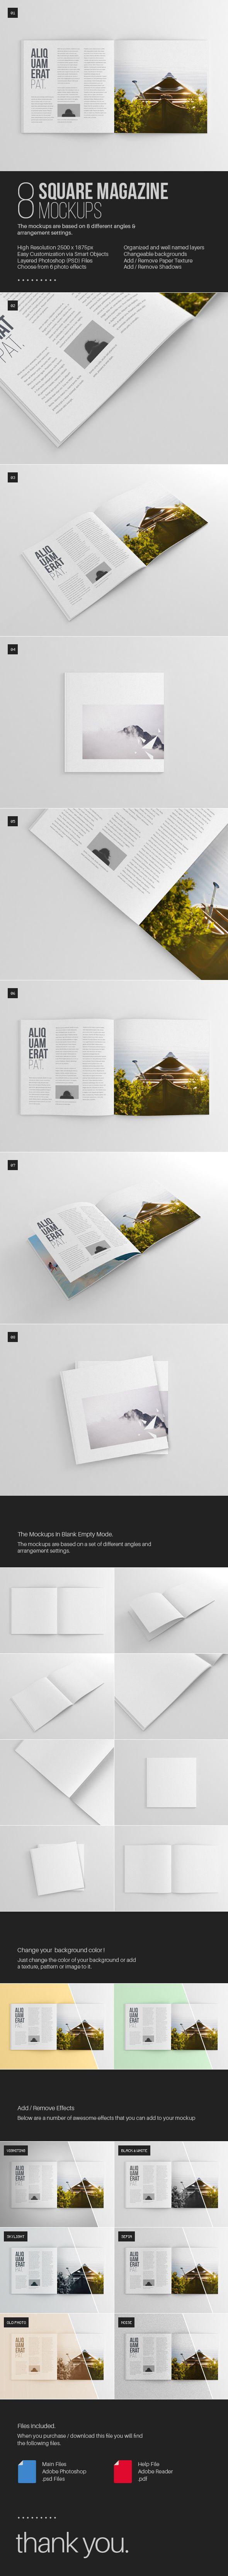 https://www.behance.net/gallery/21202131/Square-Magazine-Mockup